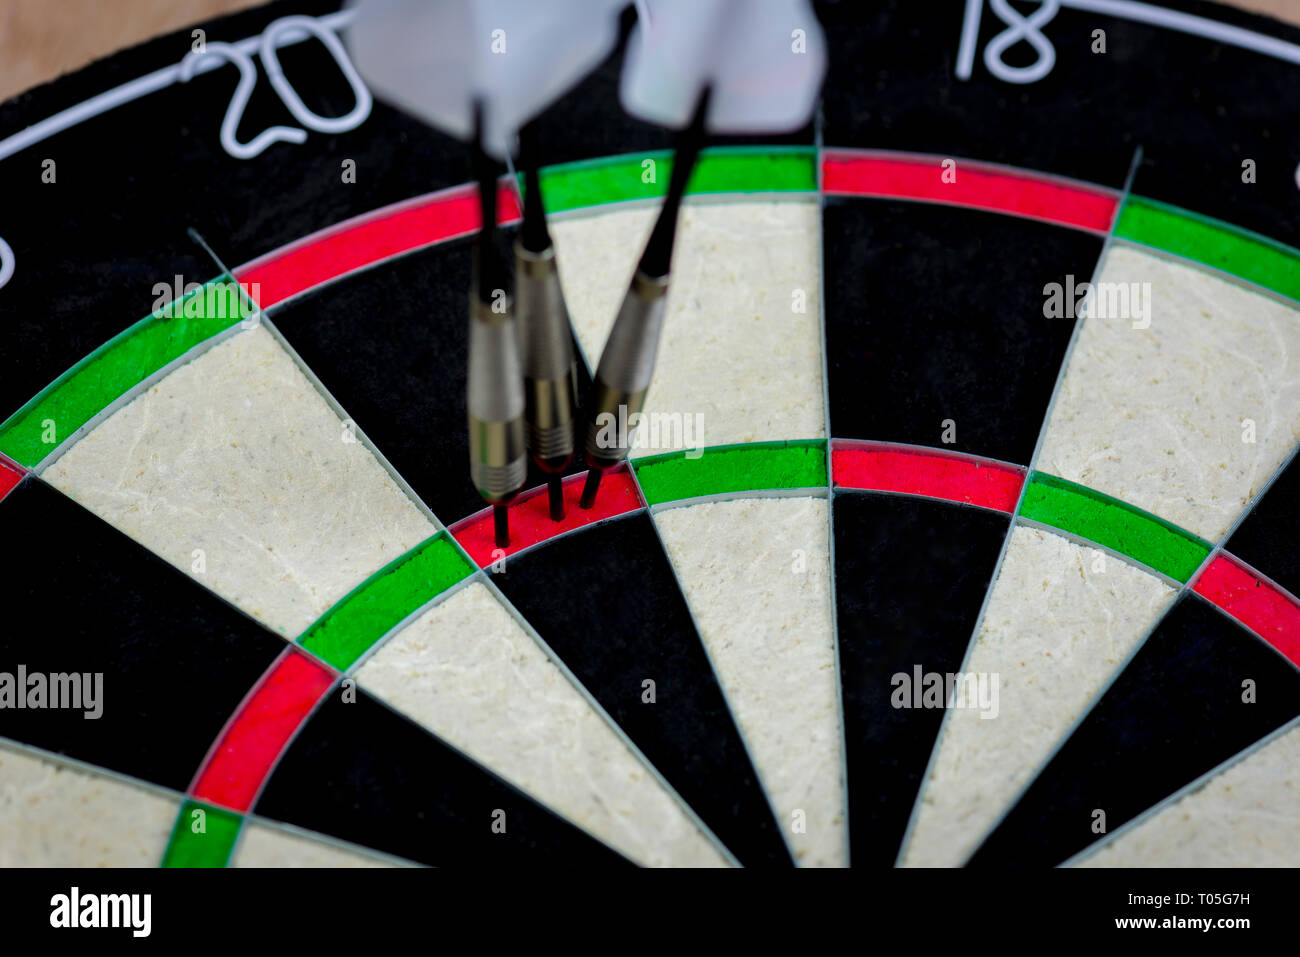 dart board with three darts in the triple twenty area. - Stock Image